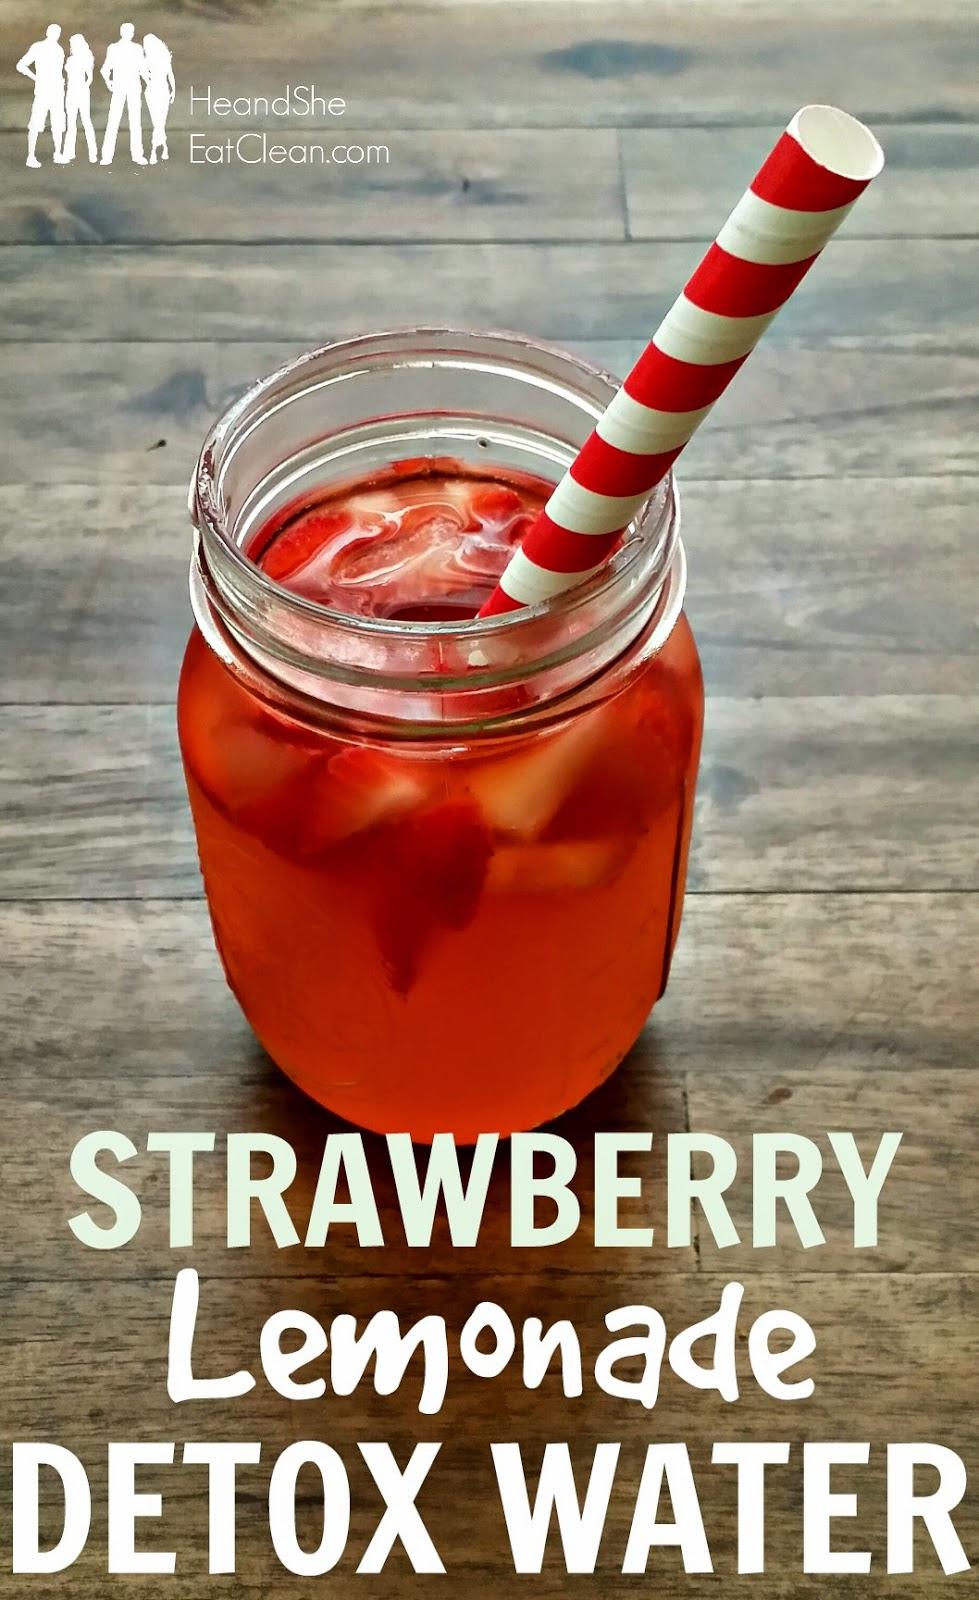 Strawberry Lemonade Detox Water